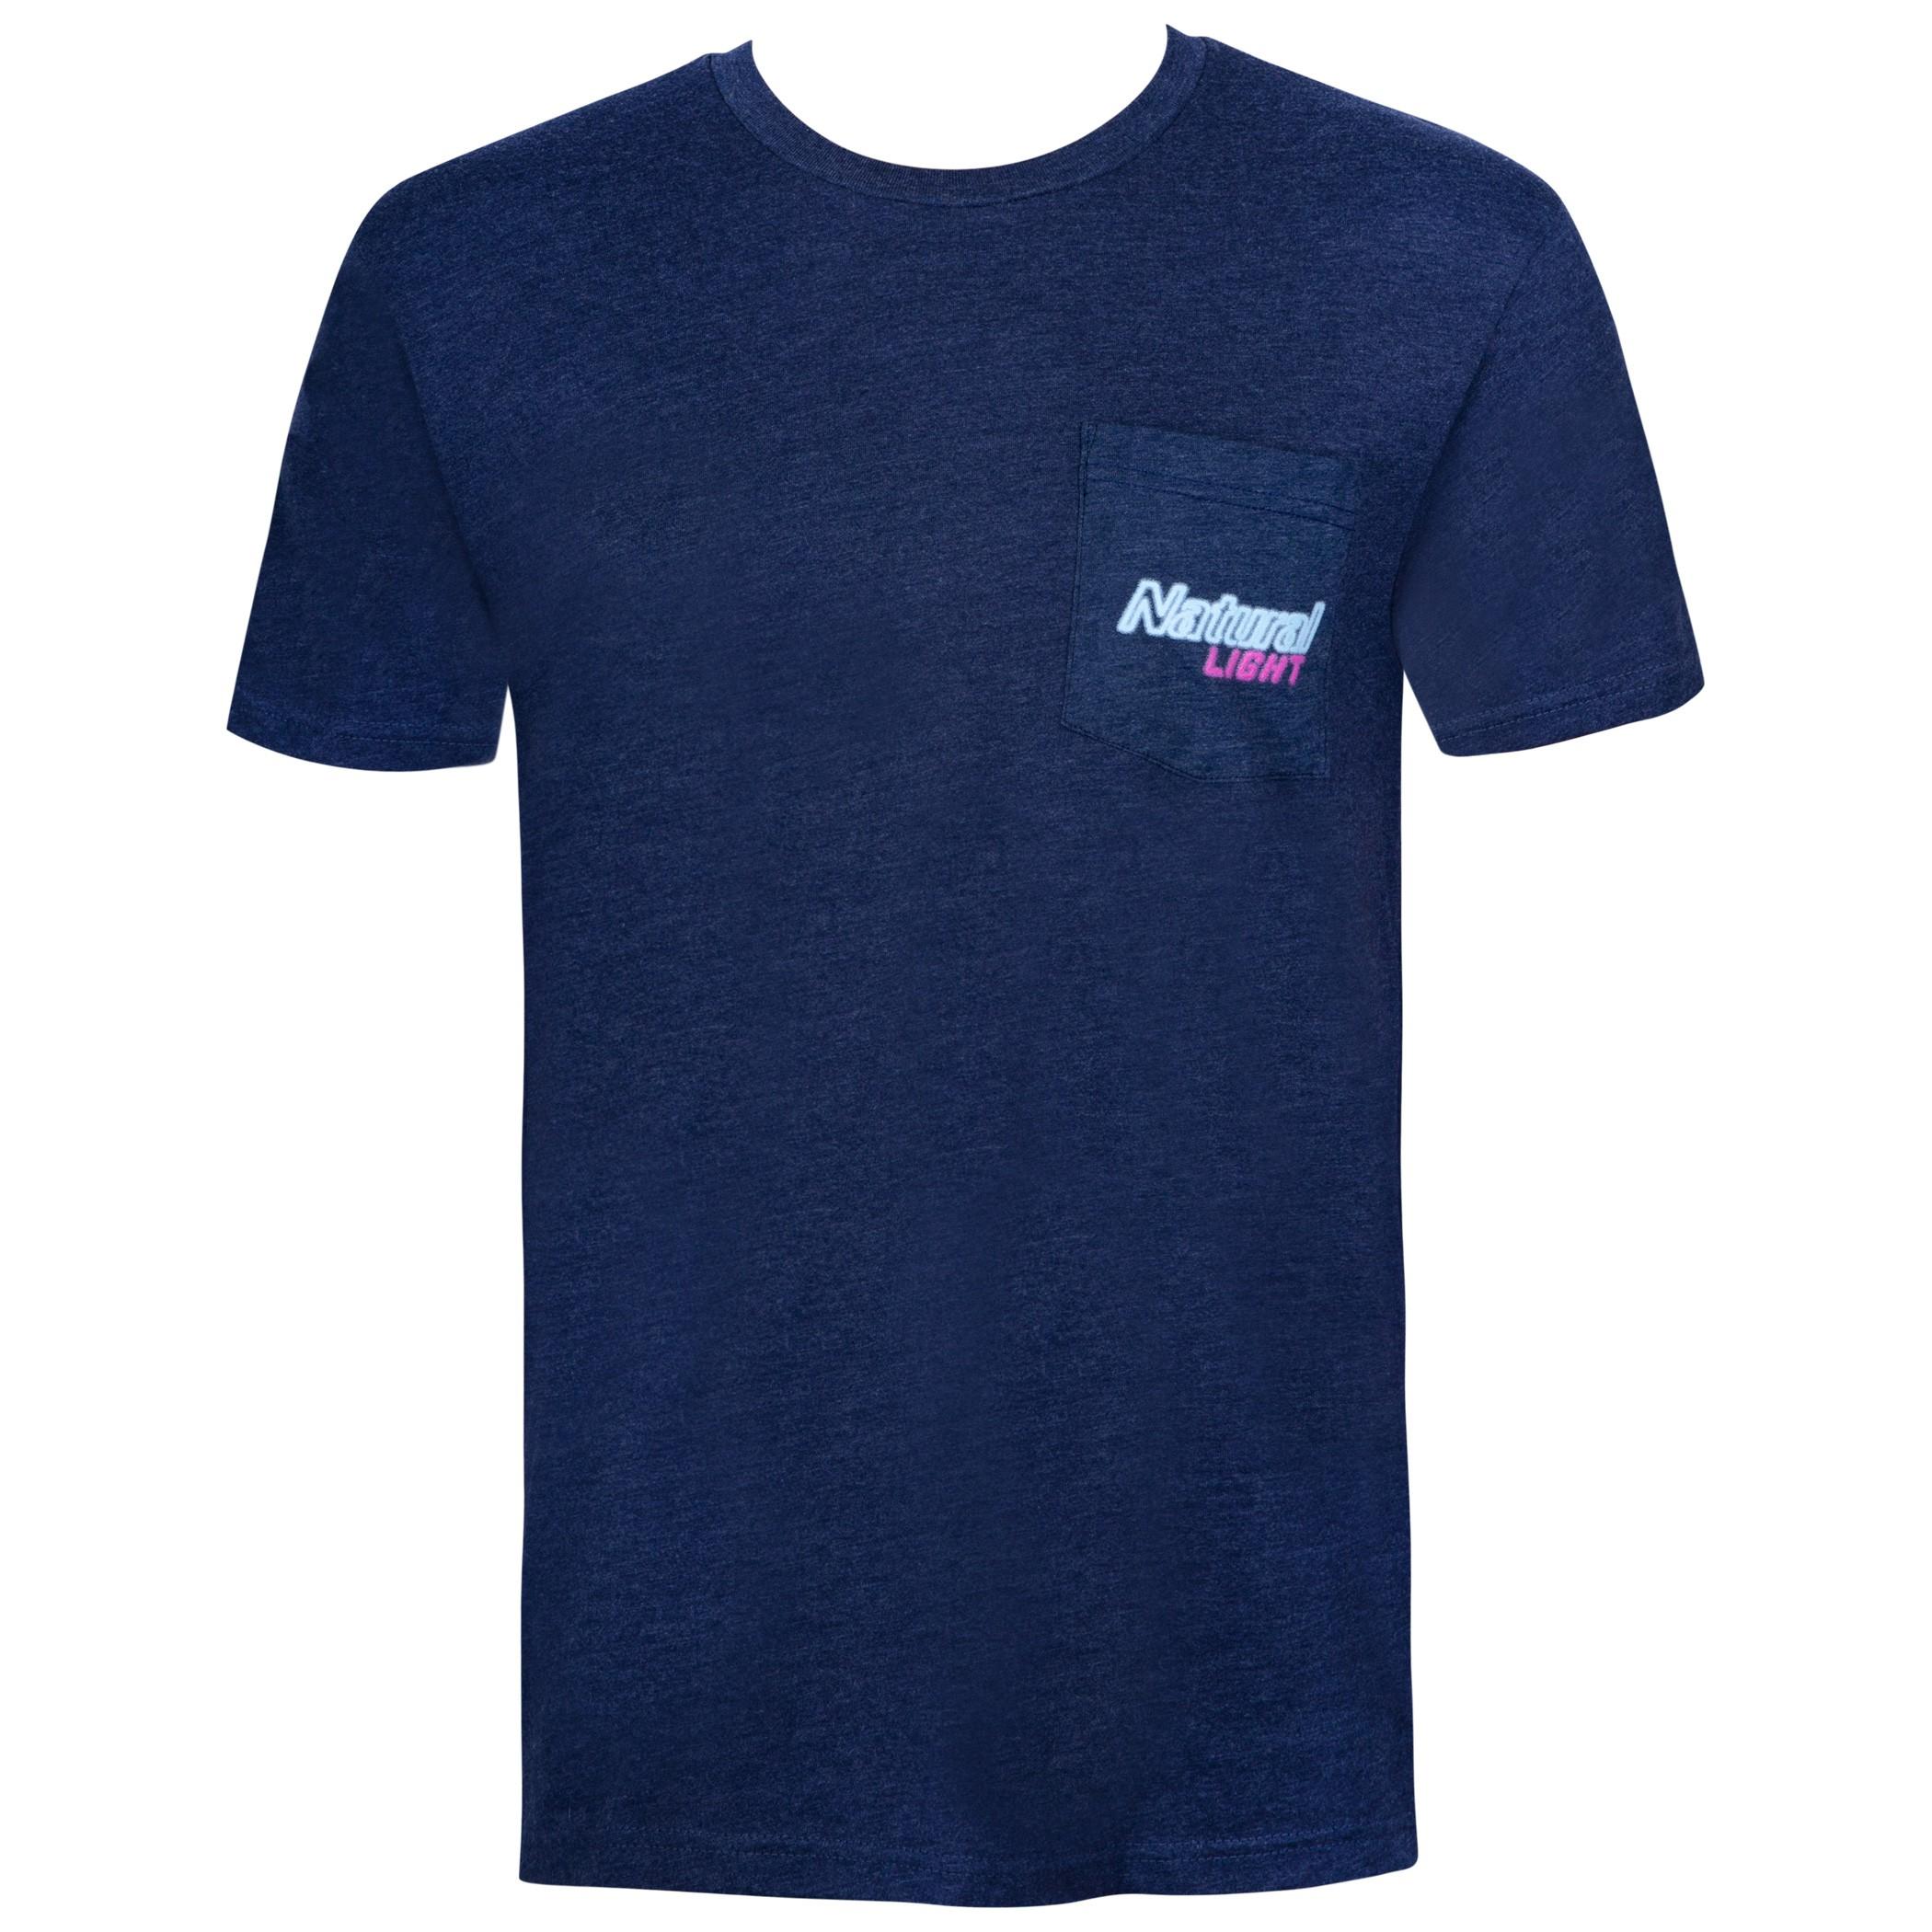 Natural Light Naturdays Neon Sign Navy Blue Tee Shirt